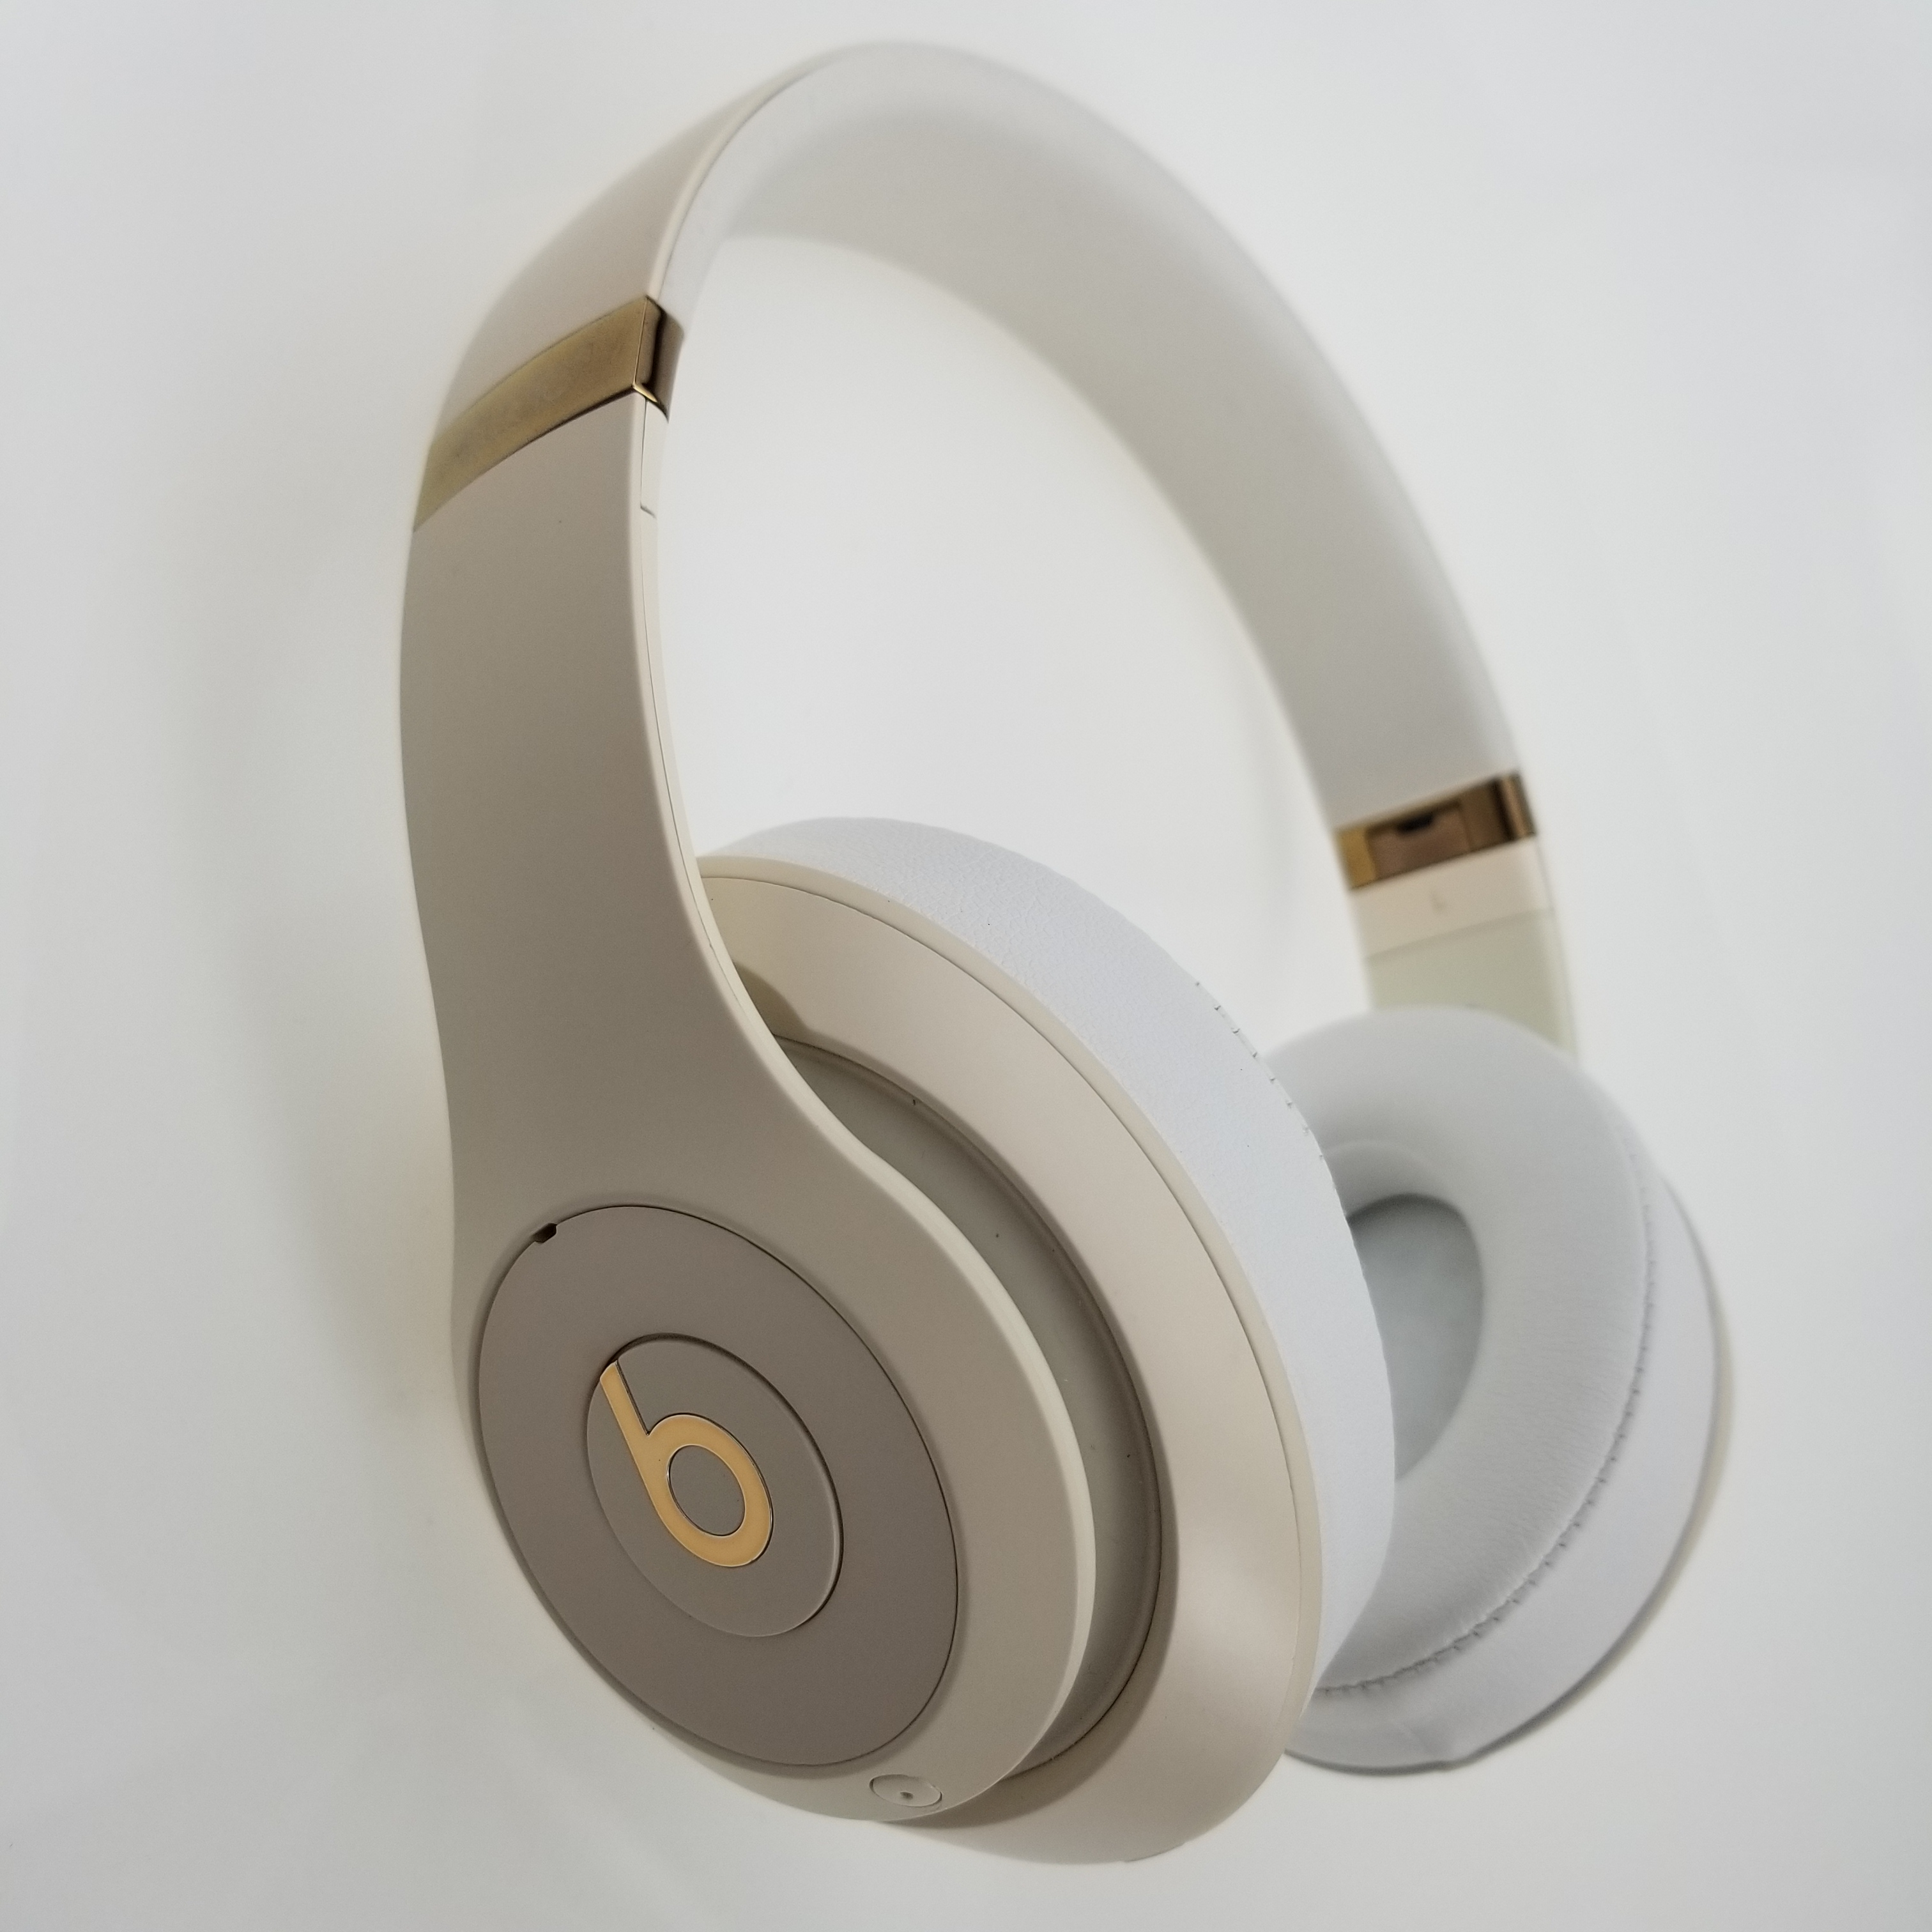 Beats Studio3 Original Over-Ear Headset Hands-free Earphone Wireless Bluetooth Headphone Music Fast Charge Anti Noise